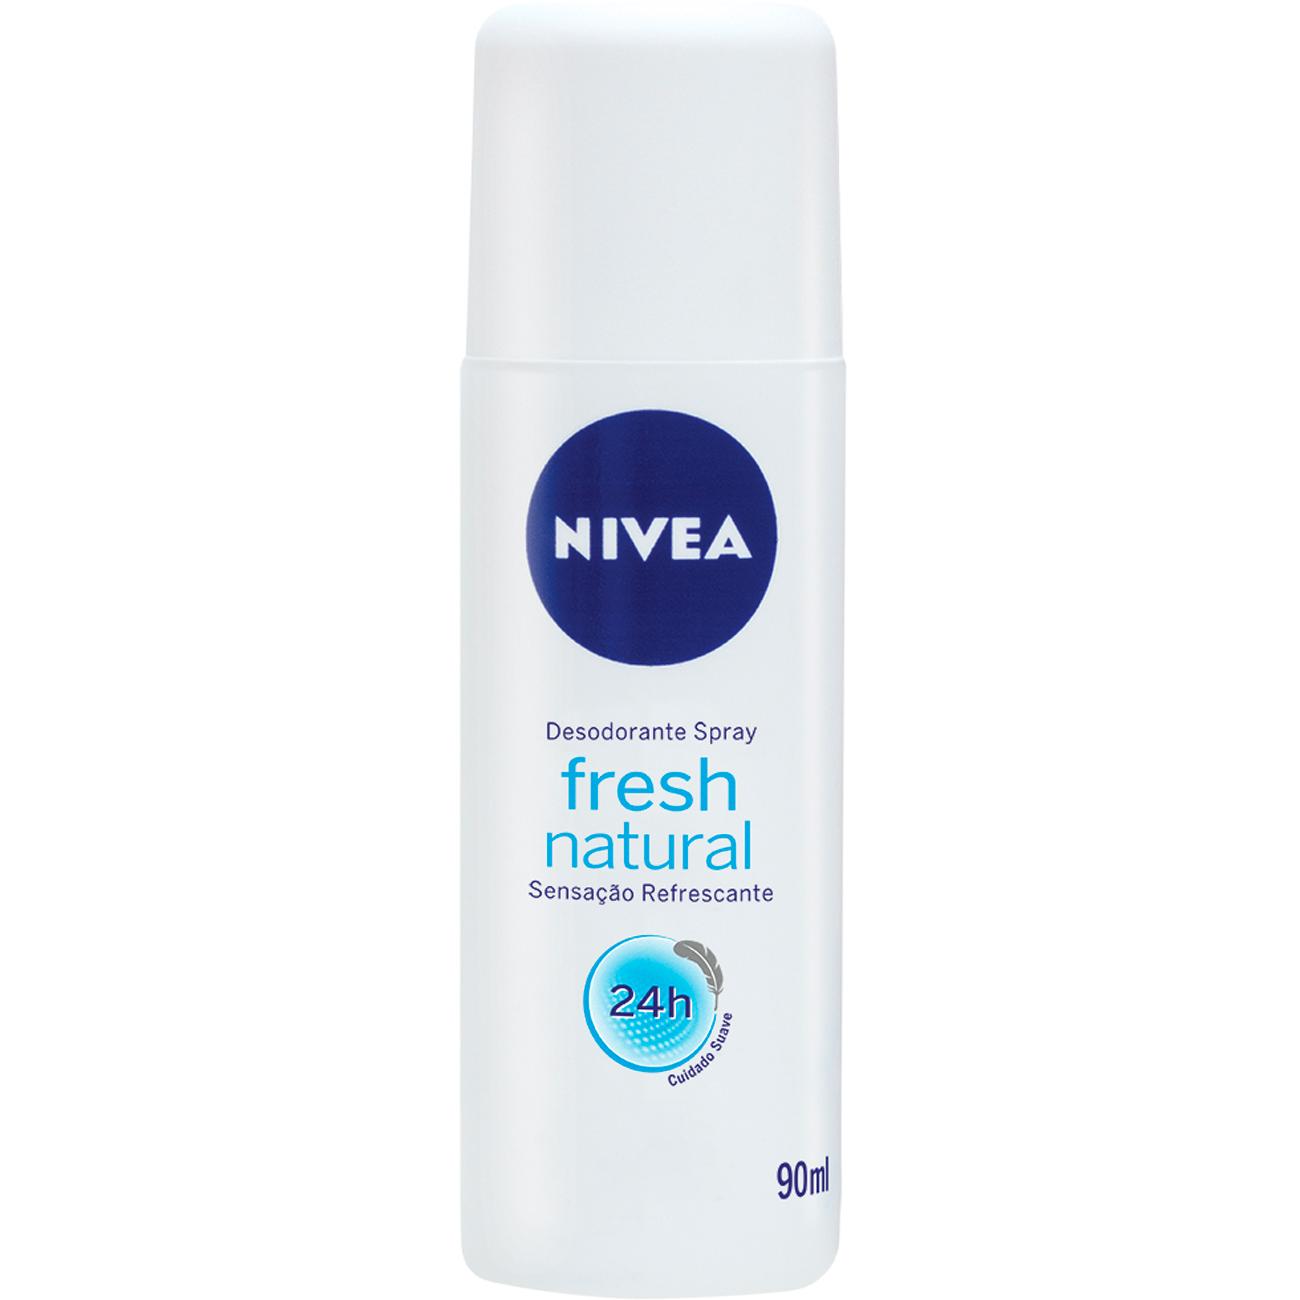 Desodorante Spray Nivea Feminino Fresh Natural 90Ml